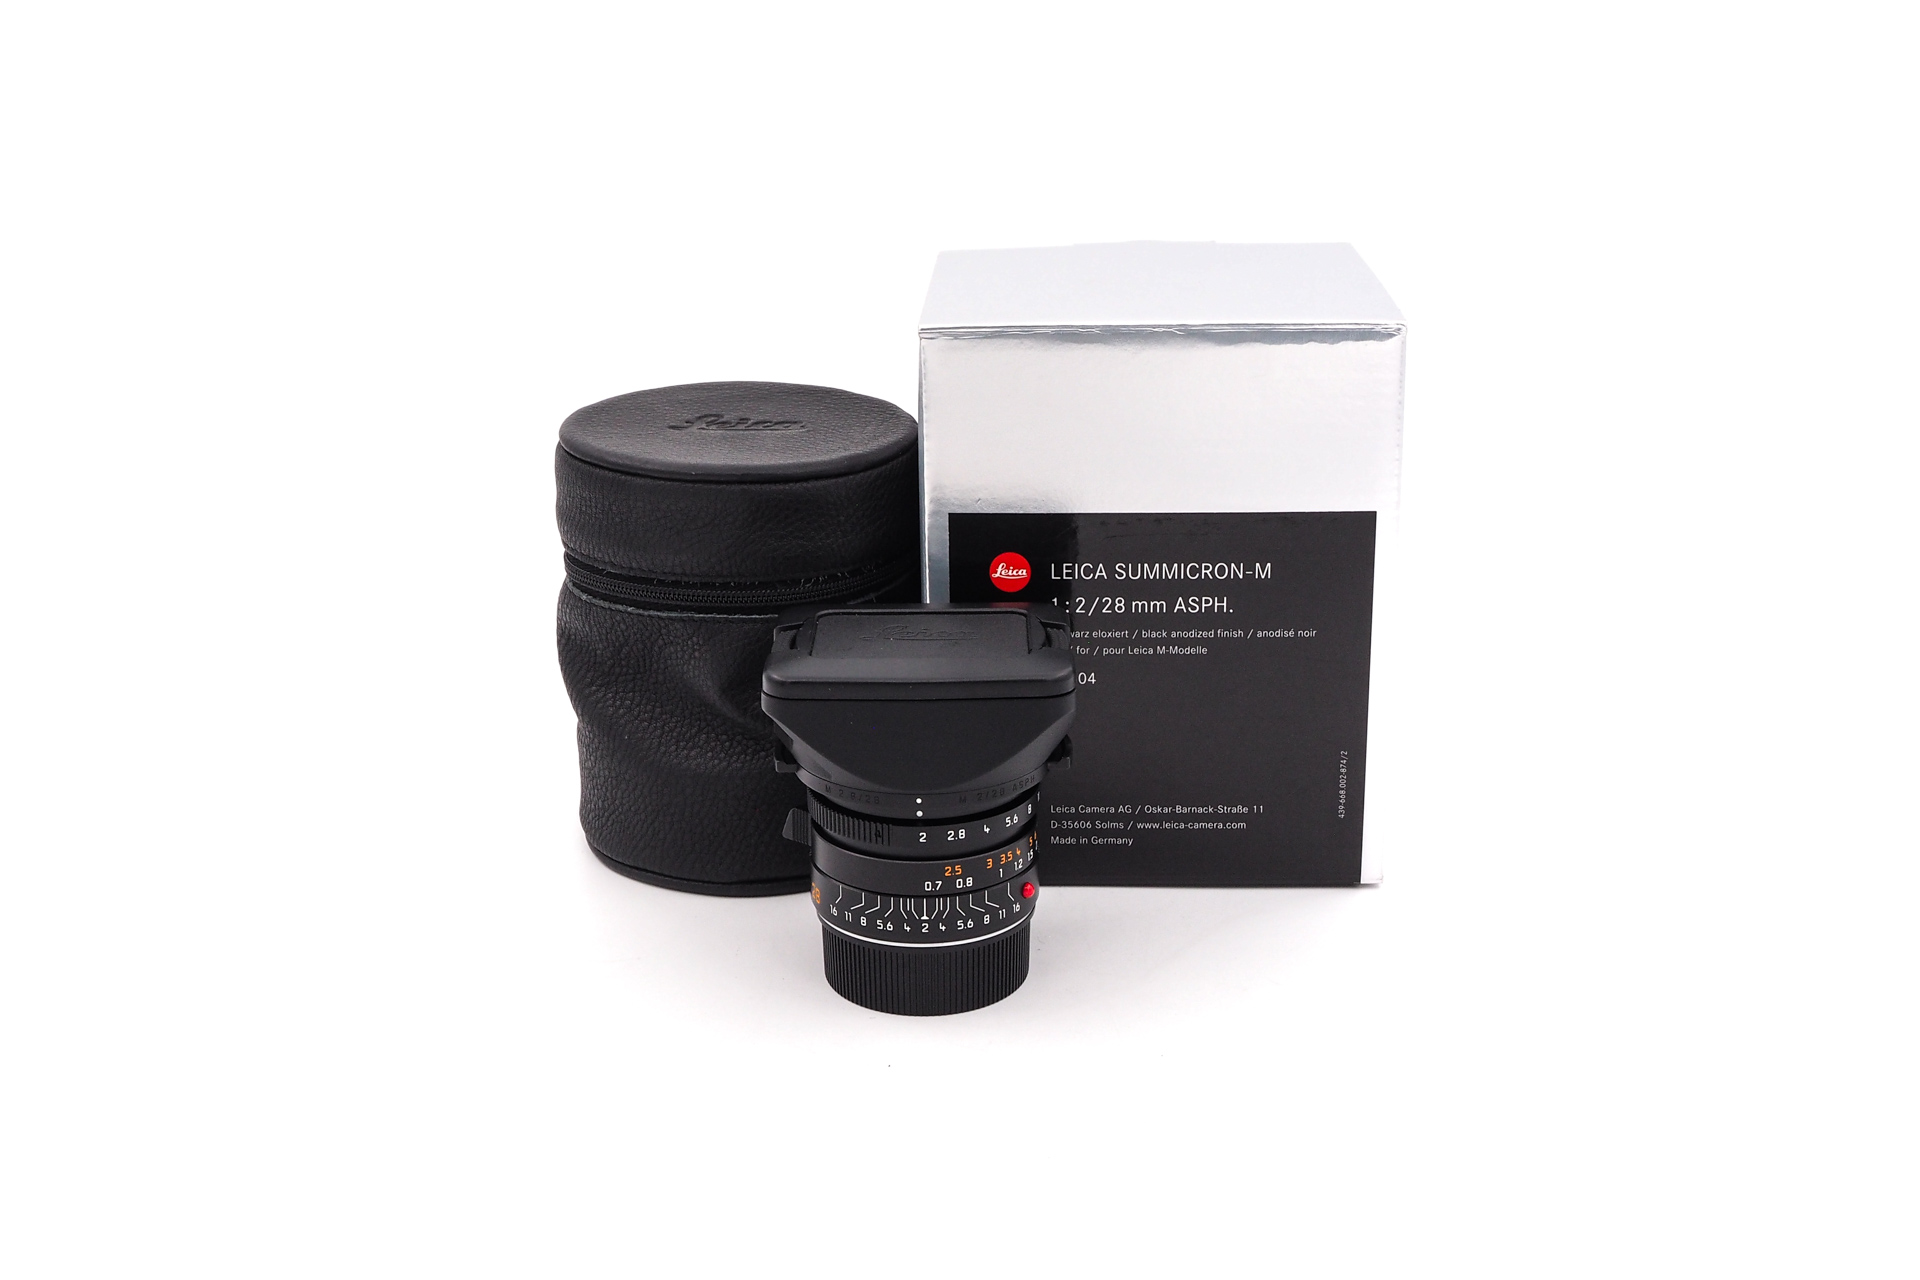 Leica Summicron-M 1:2/28mm asph. I